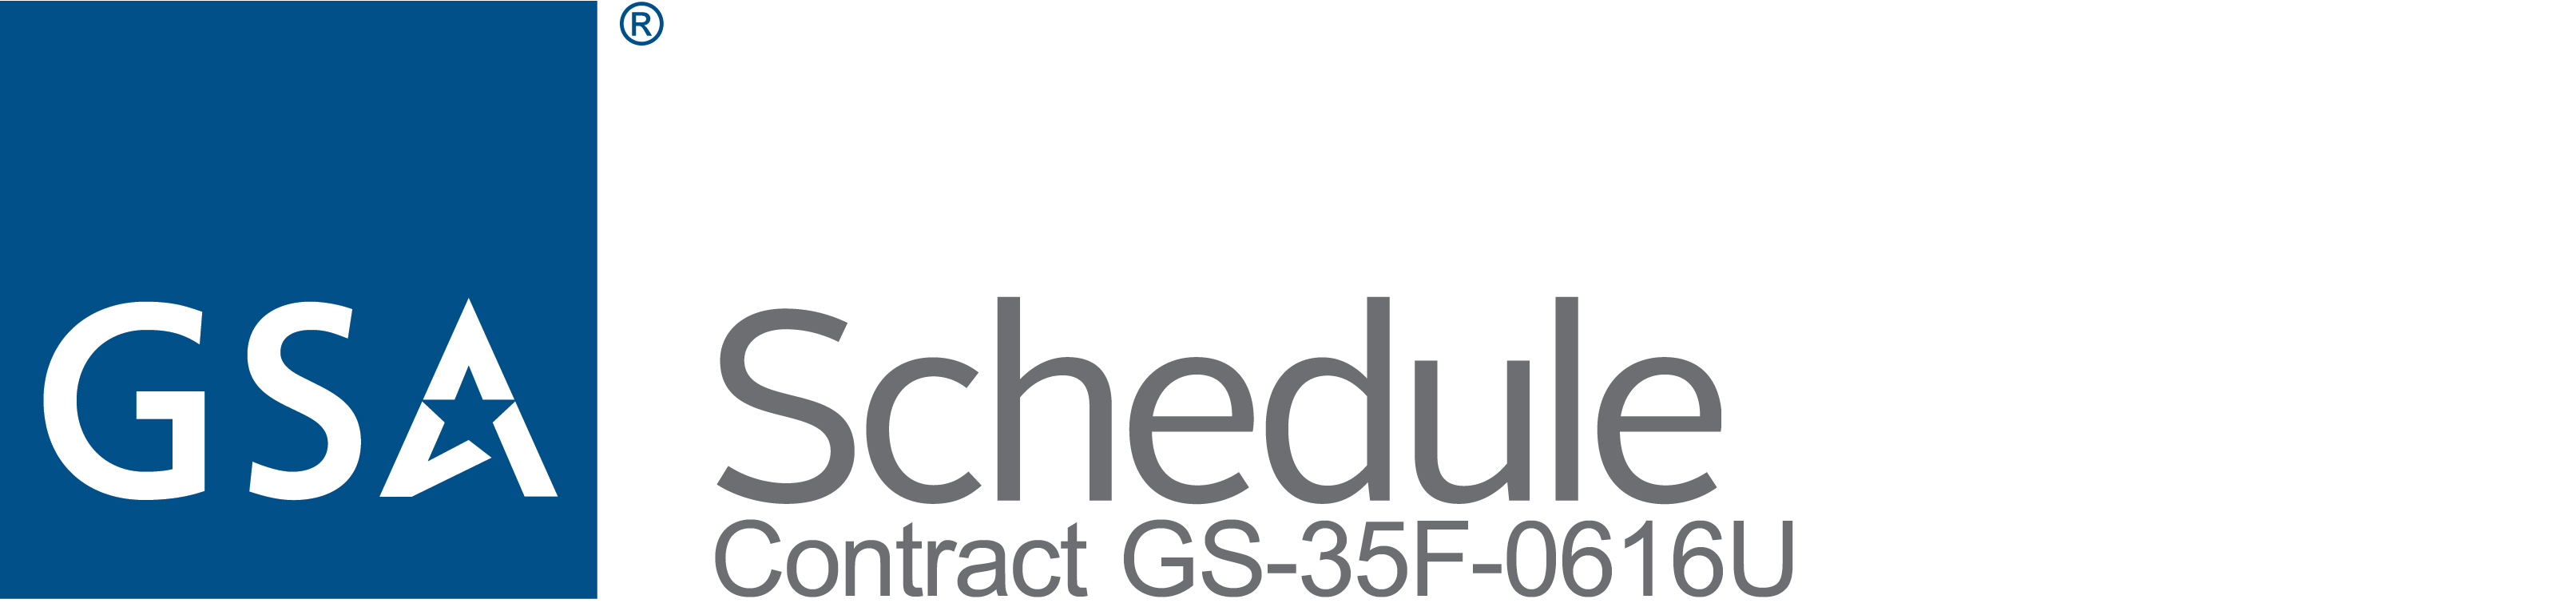 GSA Schedule Contract 35F-0616U